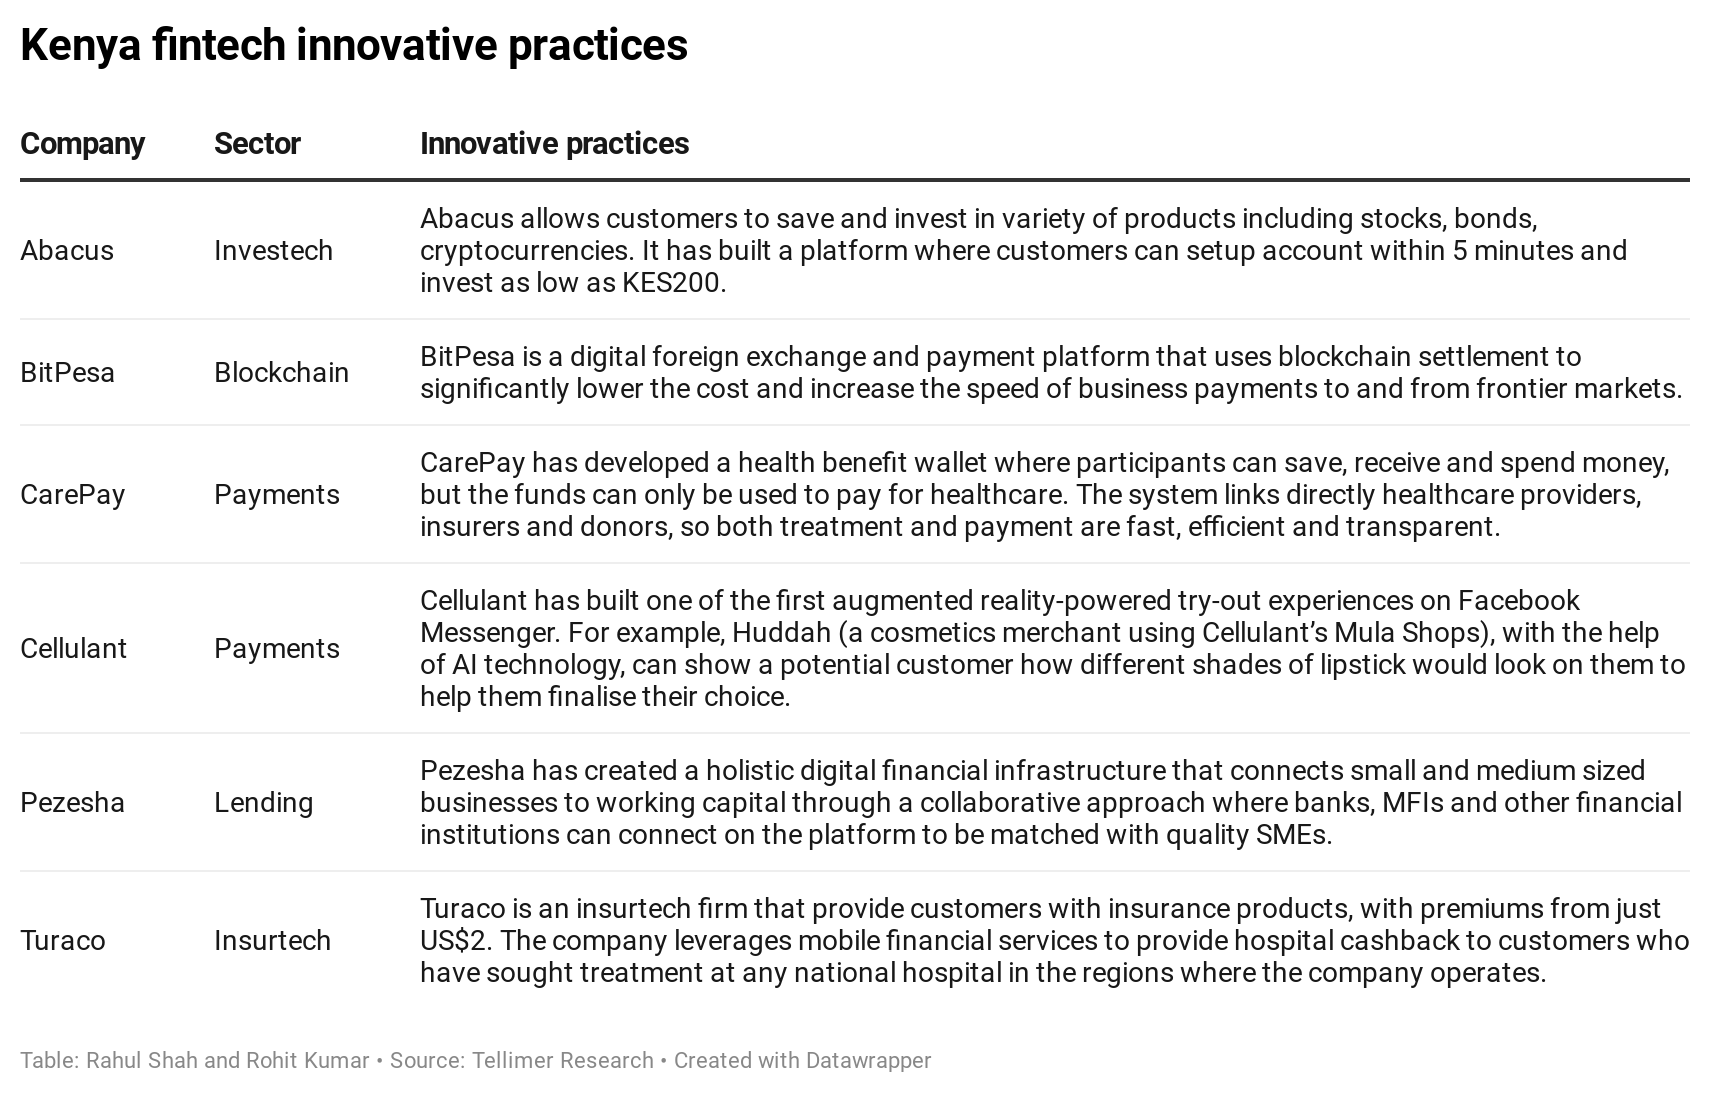 Kenya fintech innovative practices